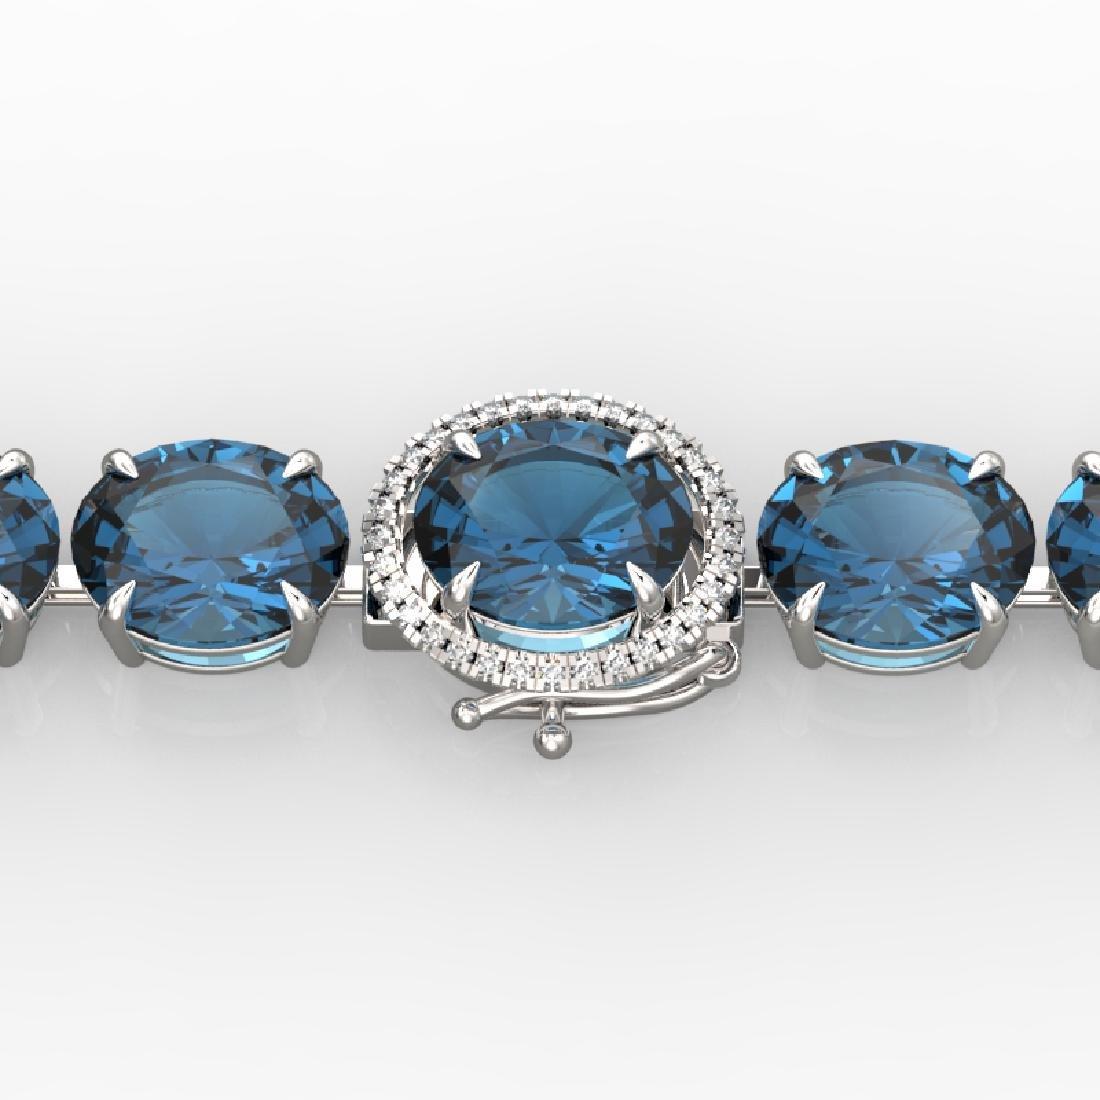 79 CTW London Blue Topaz & Micro VS/SI Diamond Halo